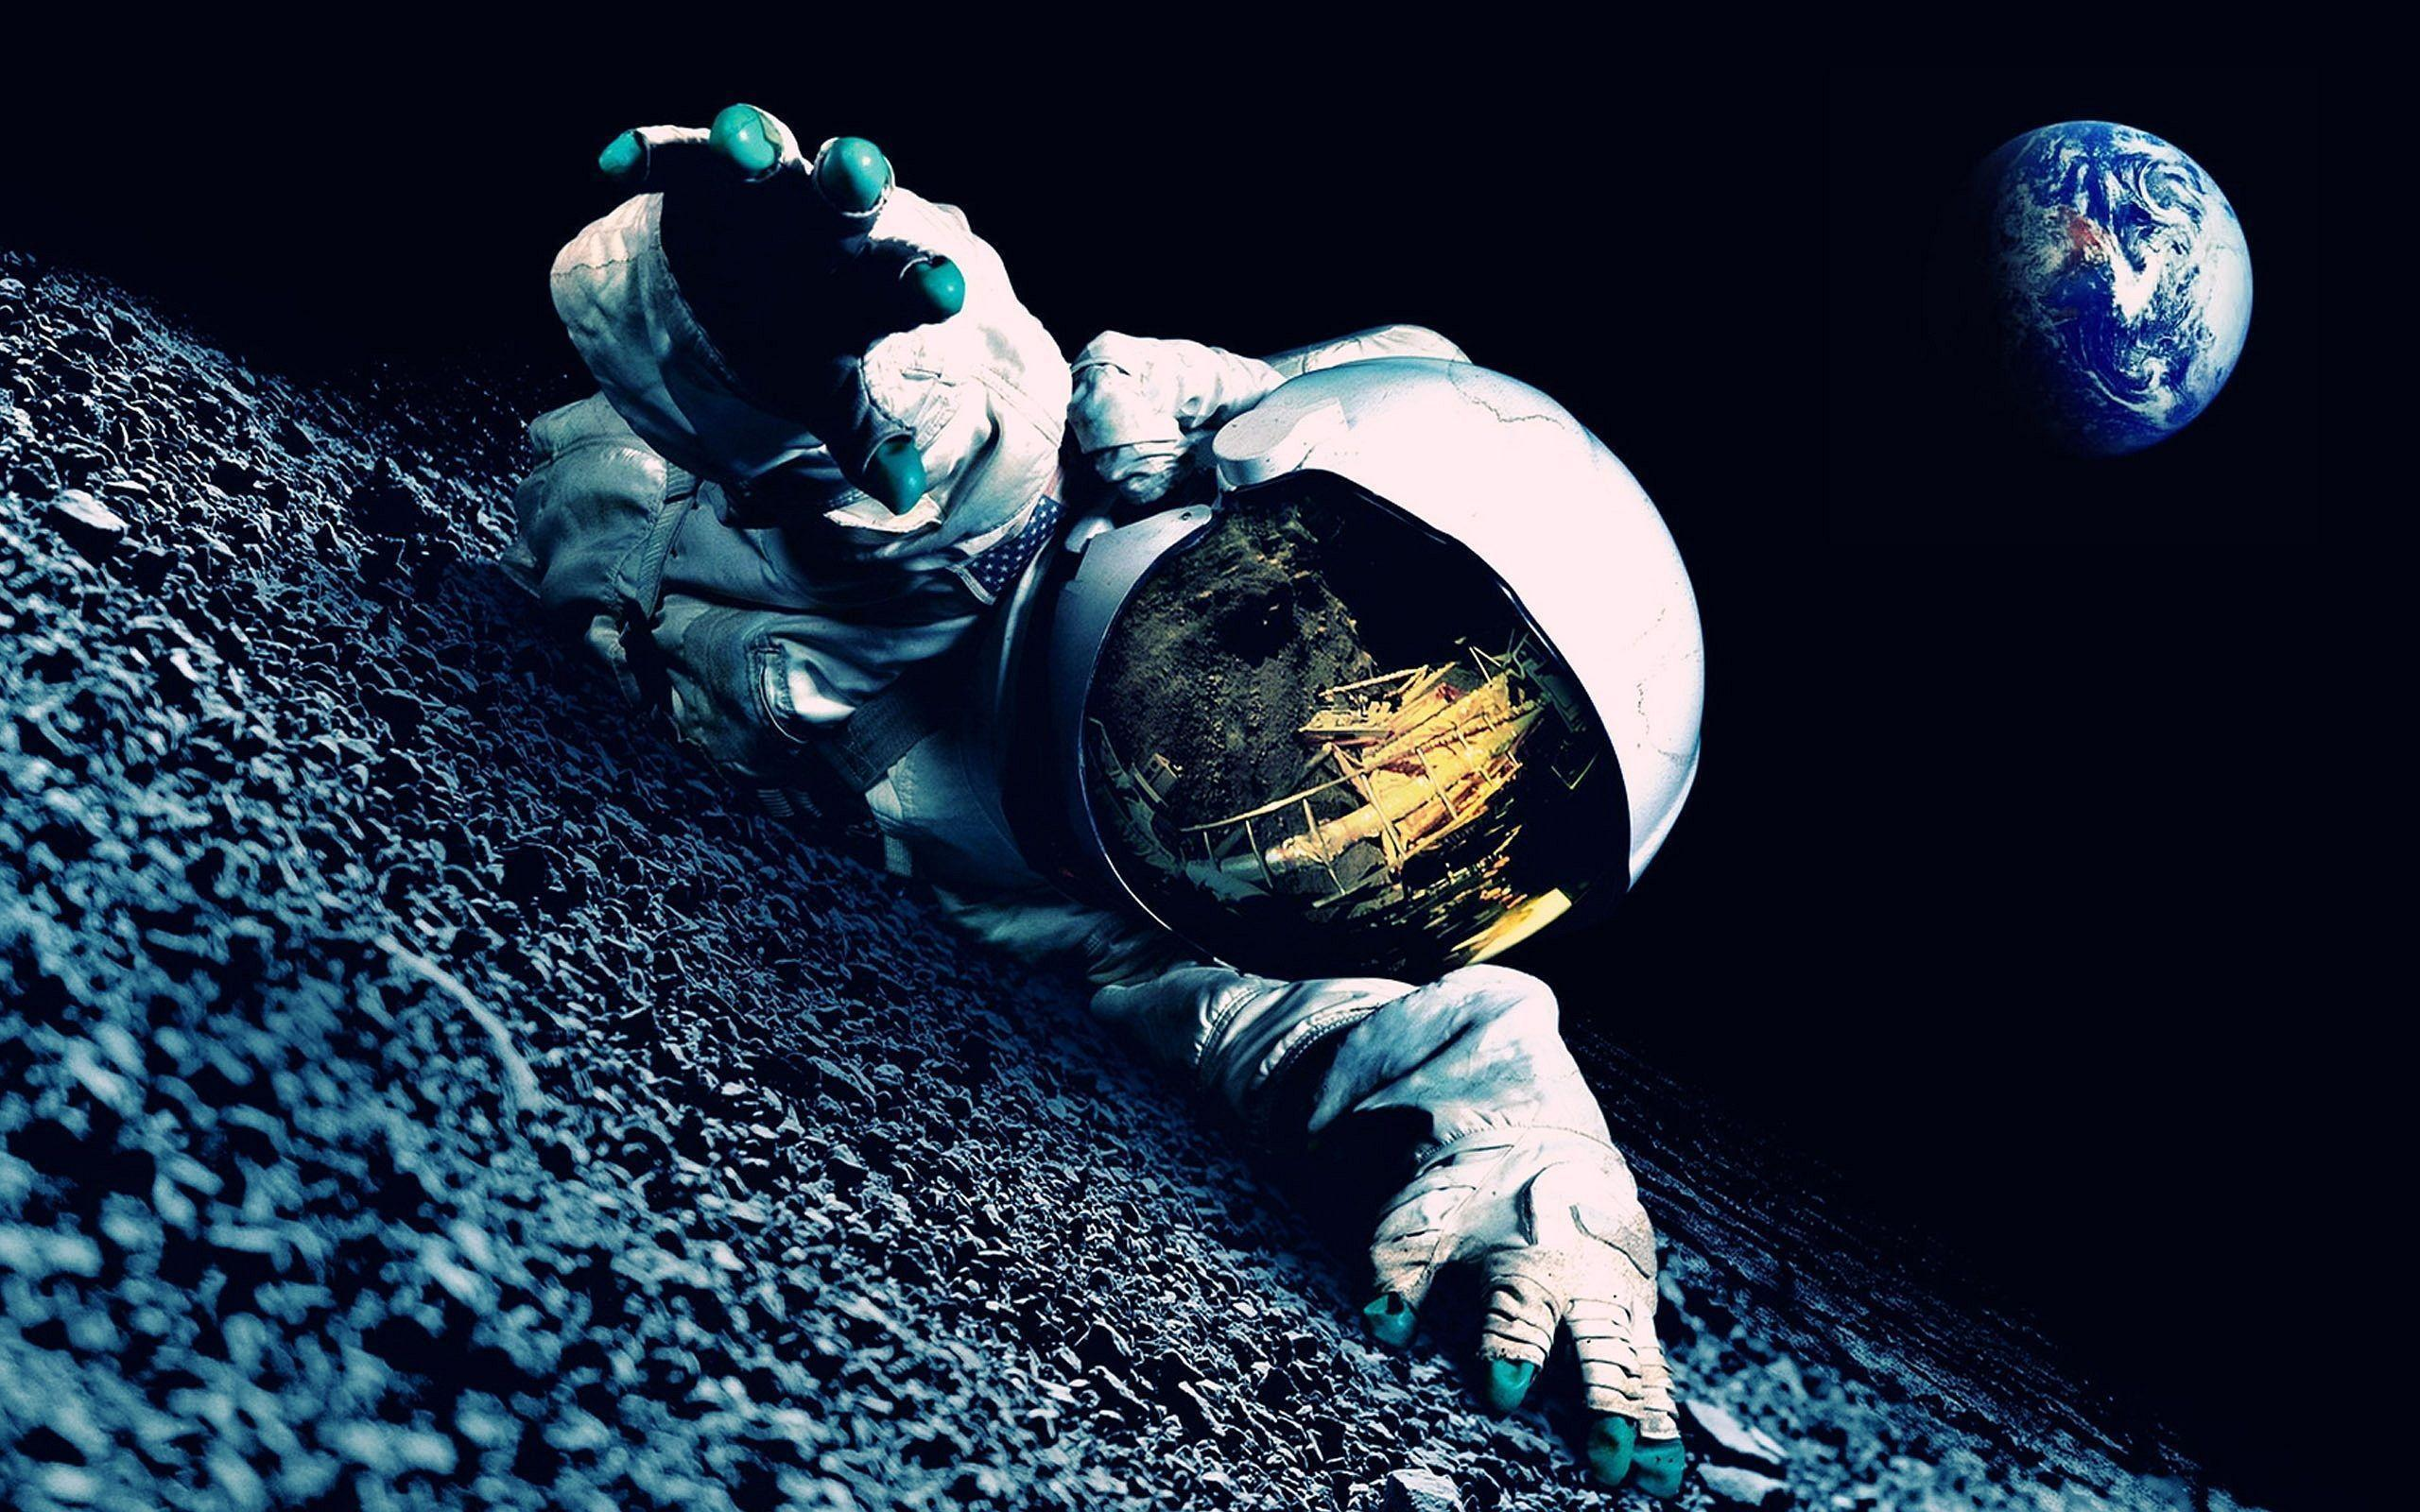 Astronaut wallpapers wallpaper cave for Espacio exterior 4k